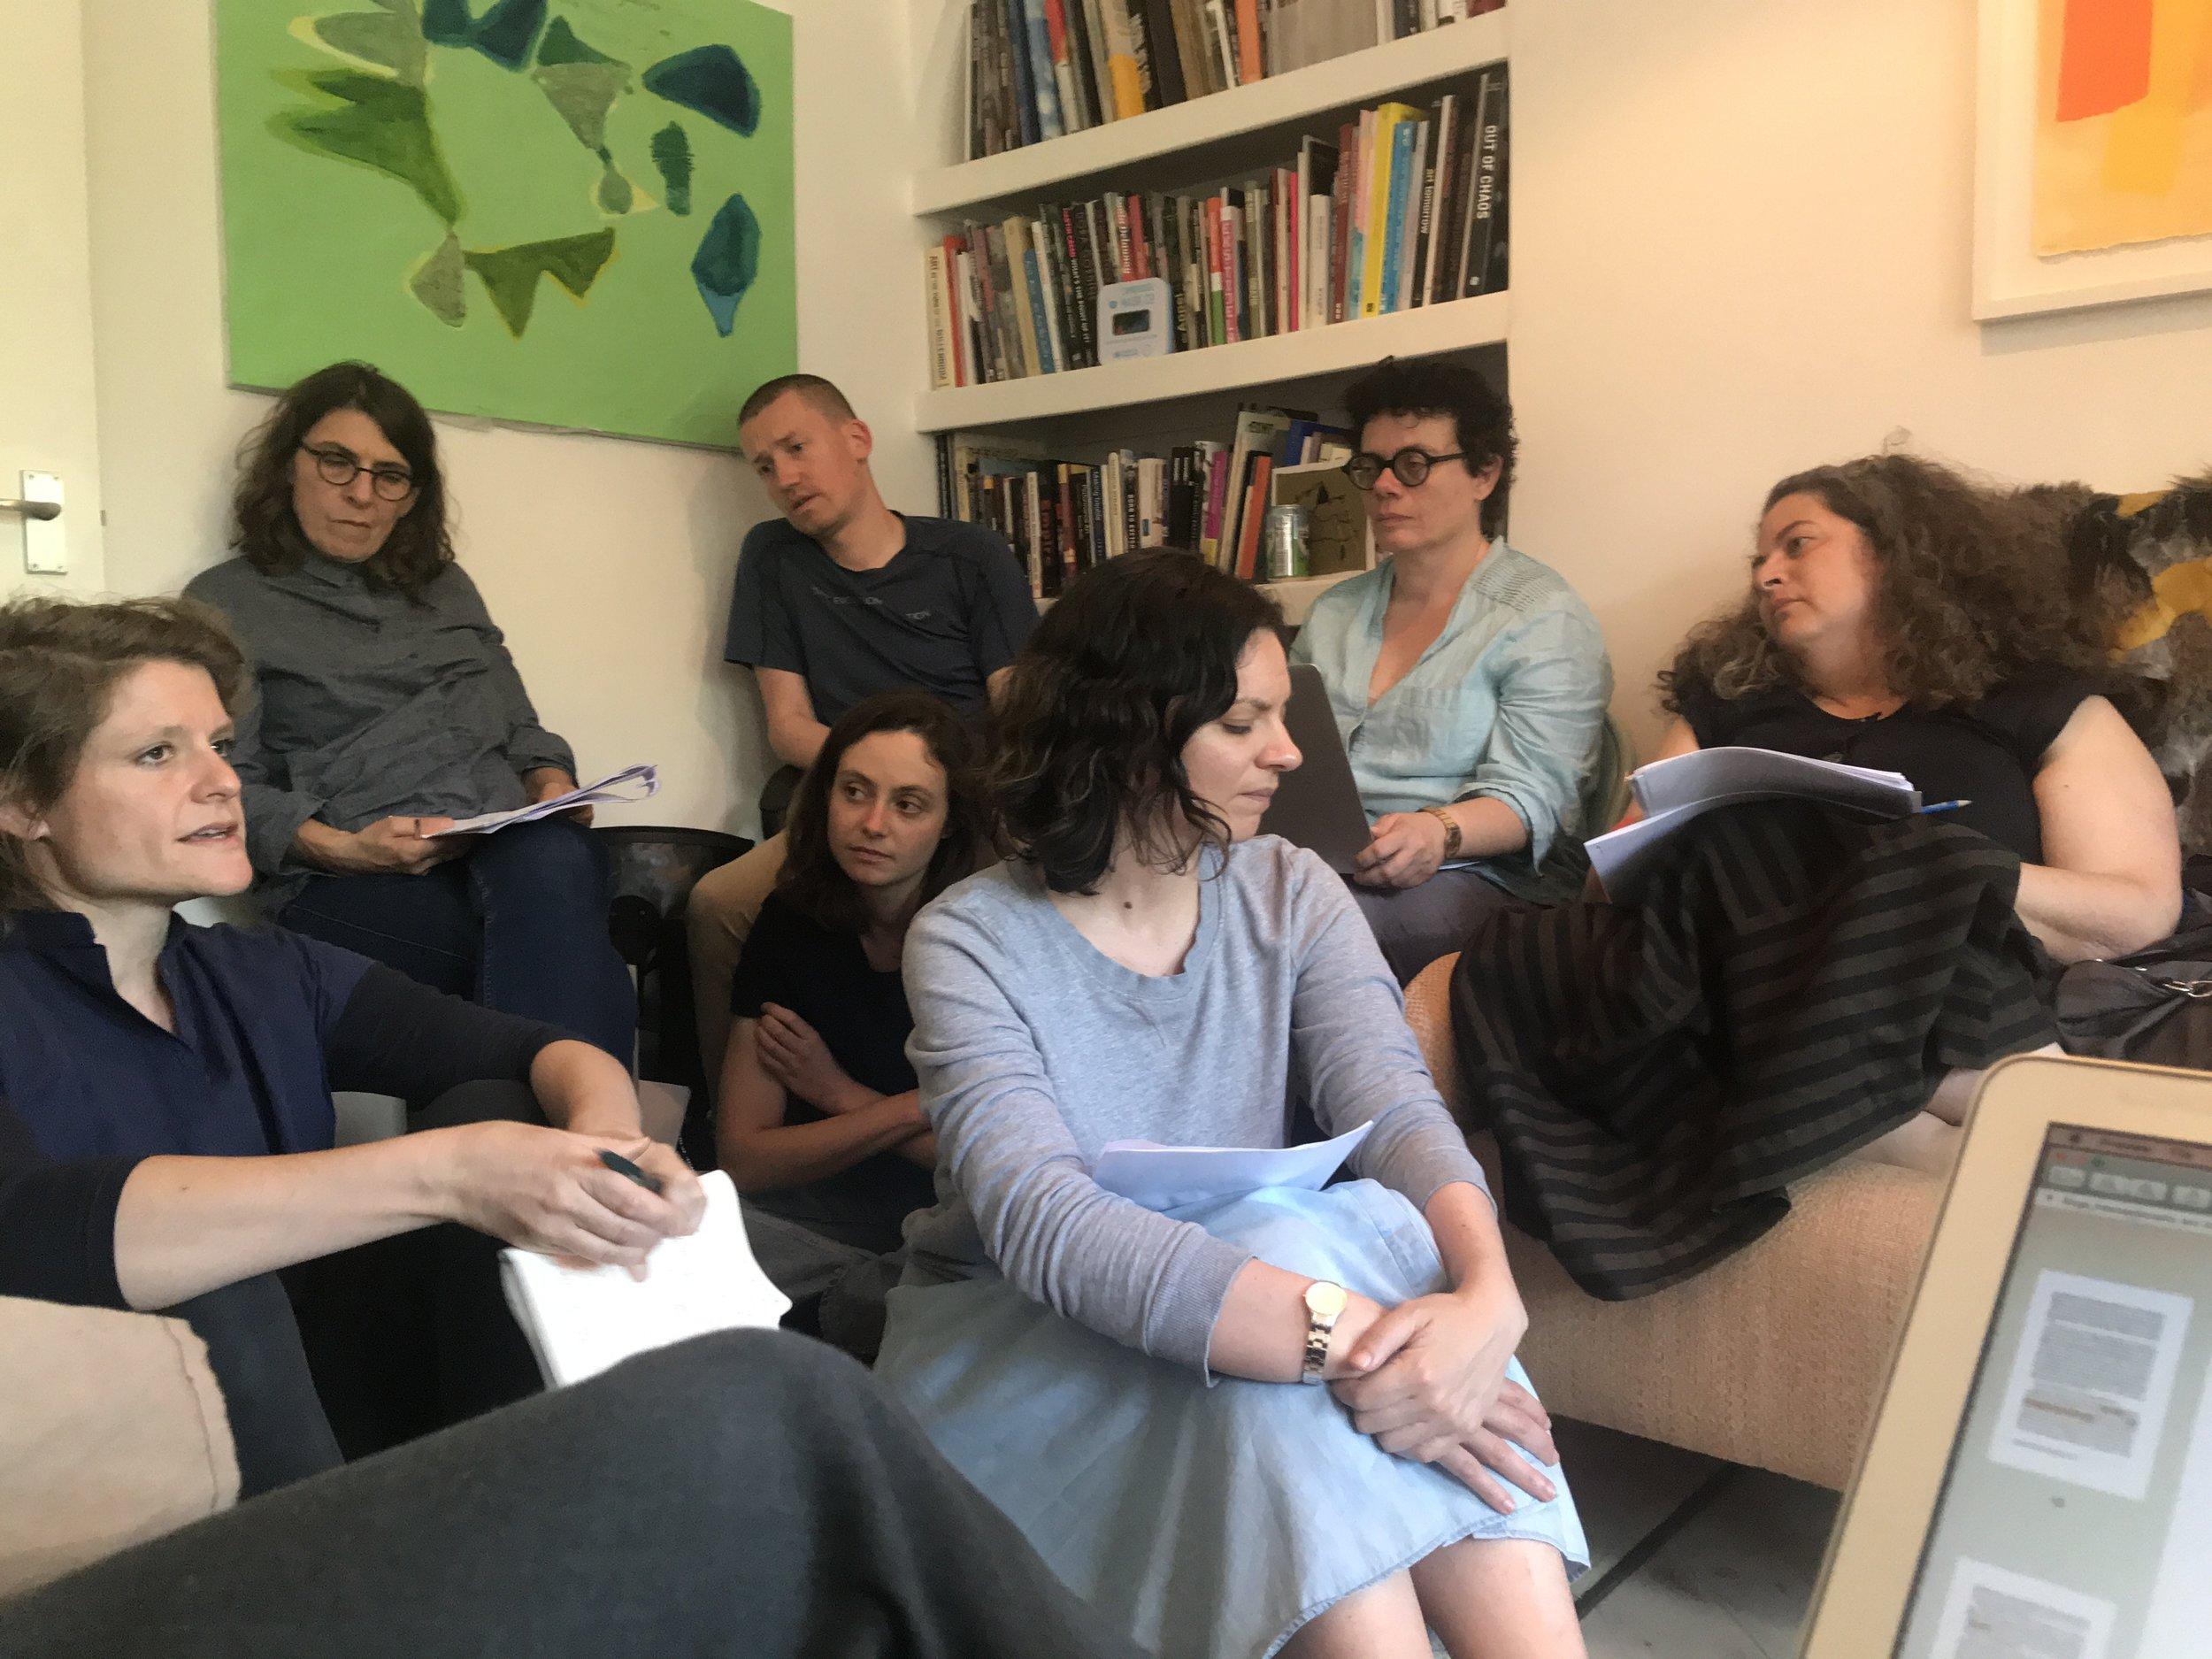 Members of the Feminist Duration Reading Group explore ecofeminisms, 2 June 2018. Photo Helena Reckitt.